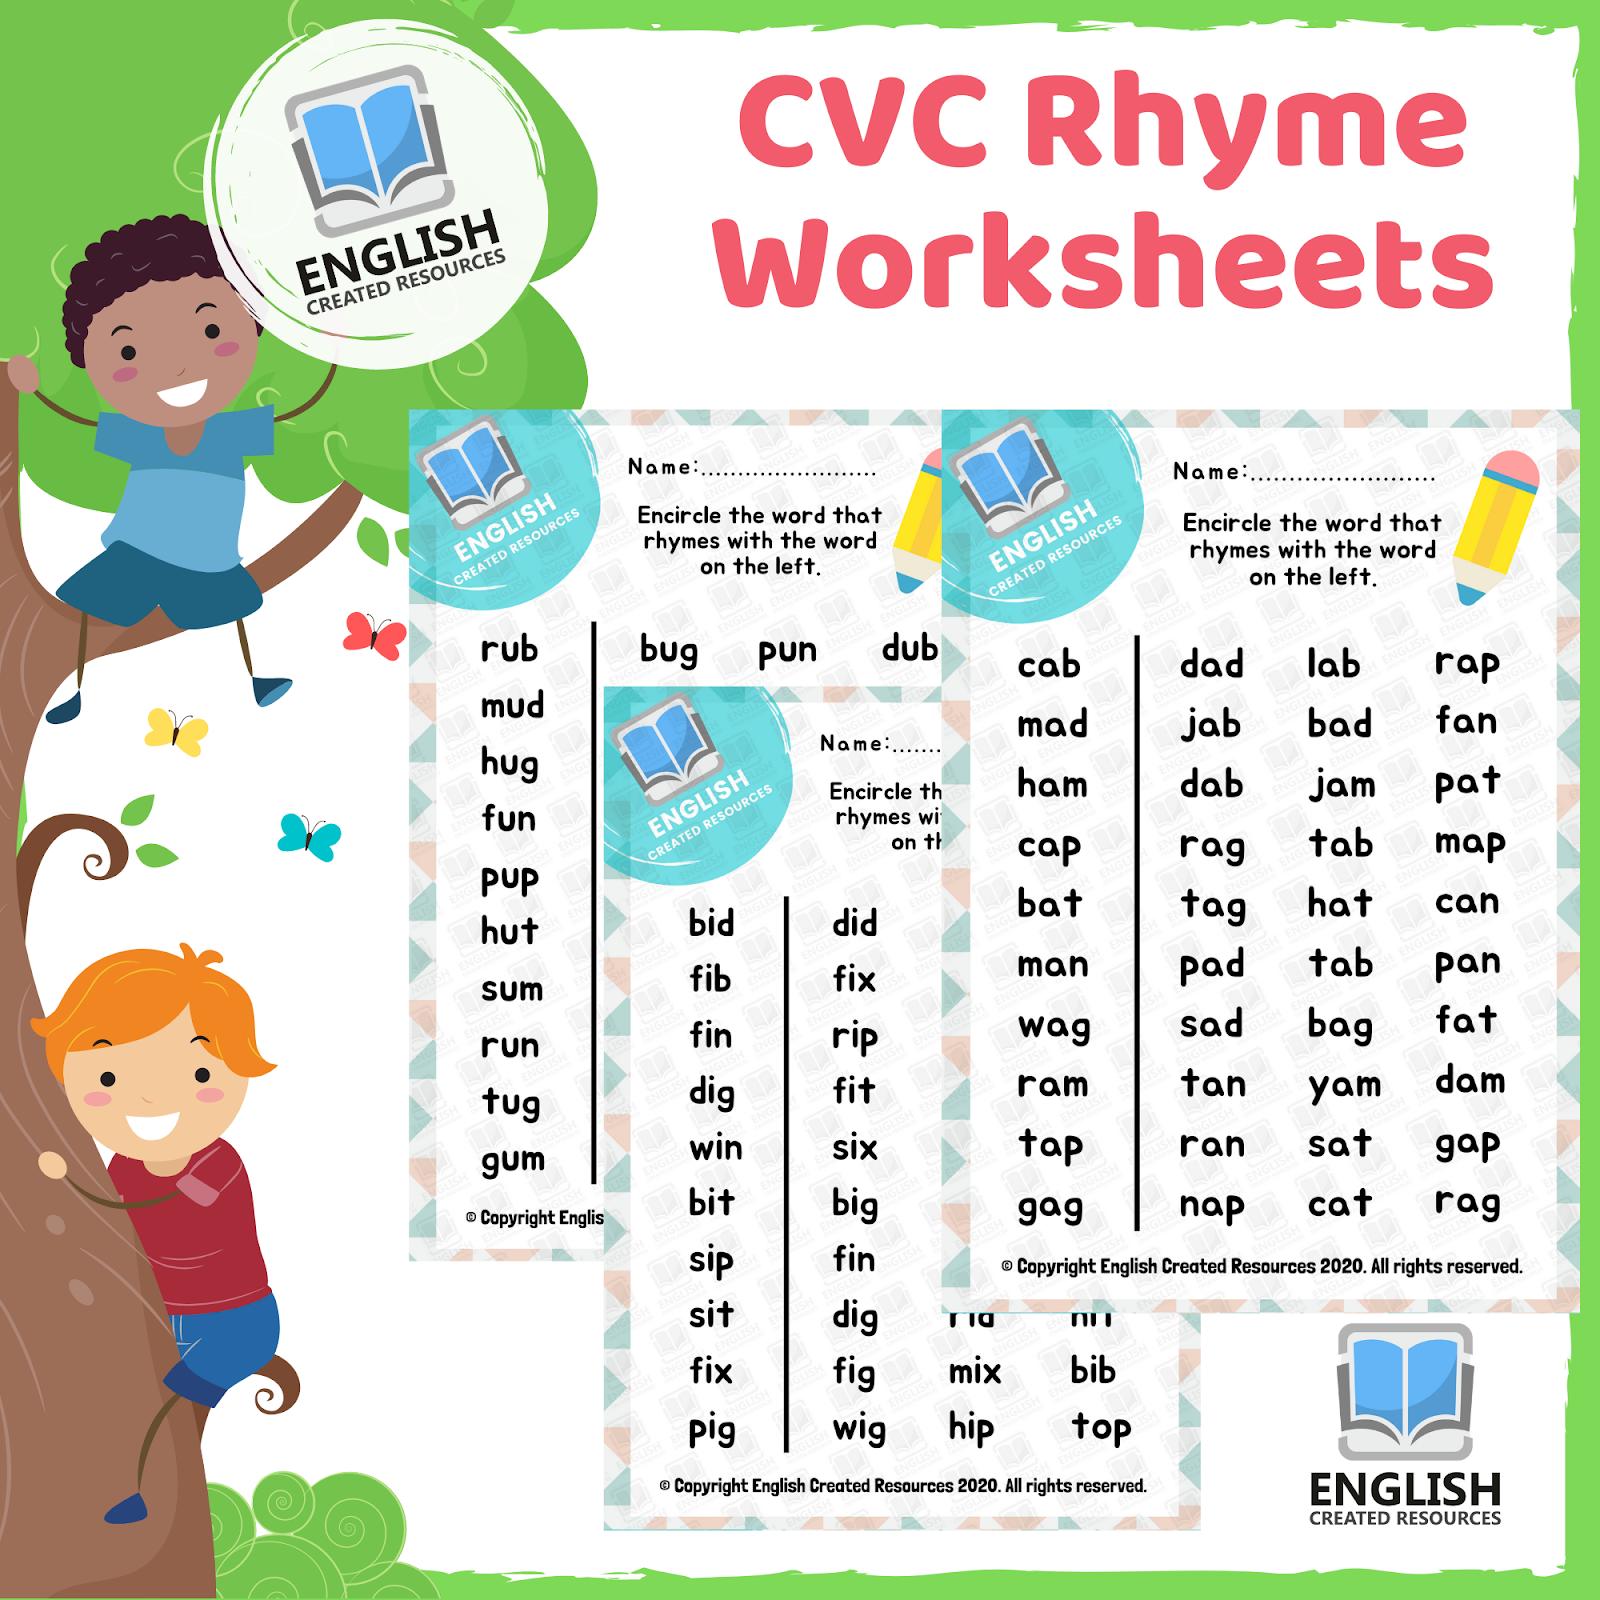 Cvc Rhyme Worksheets